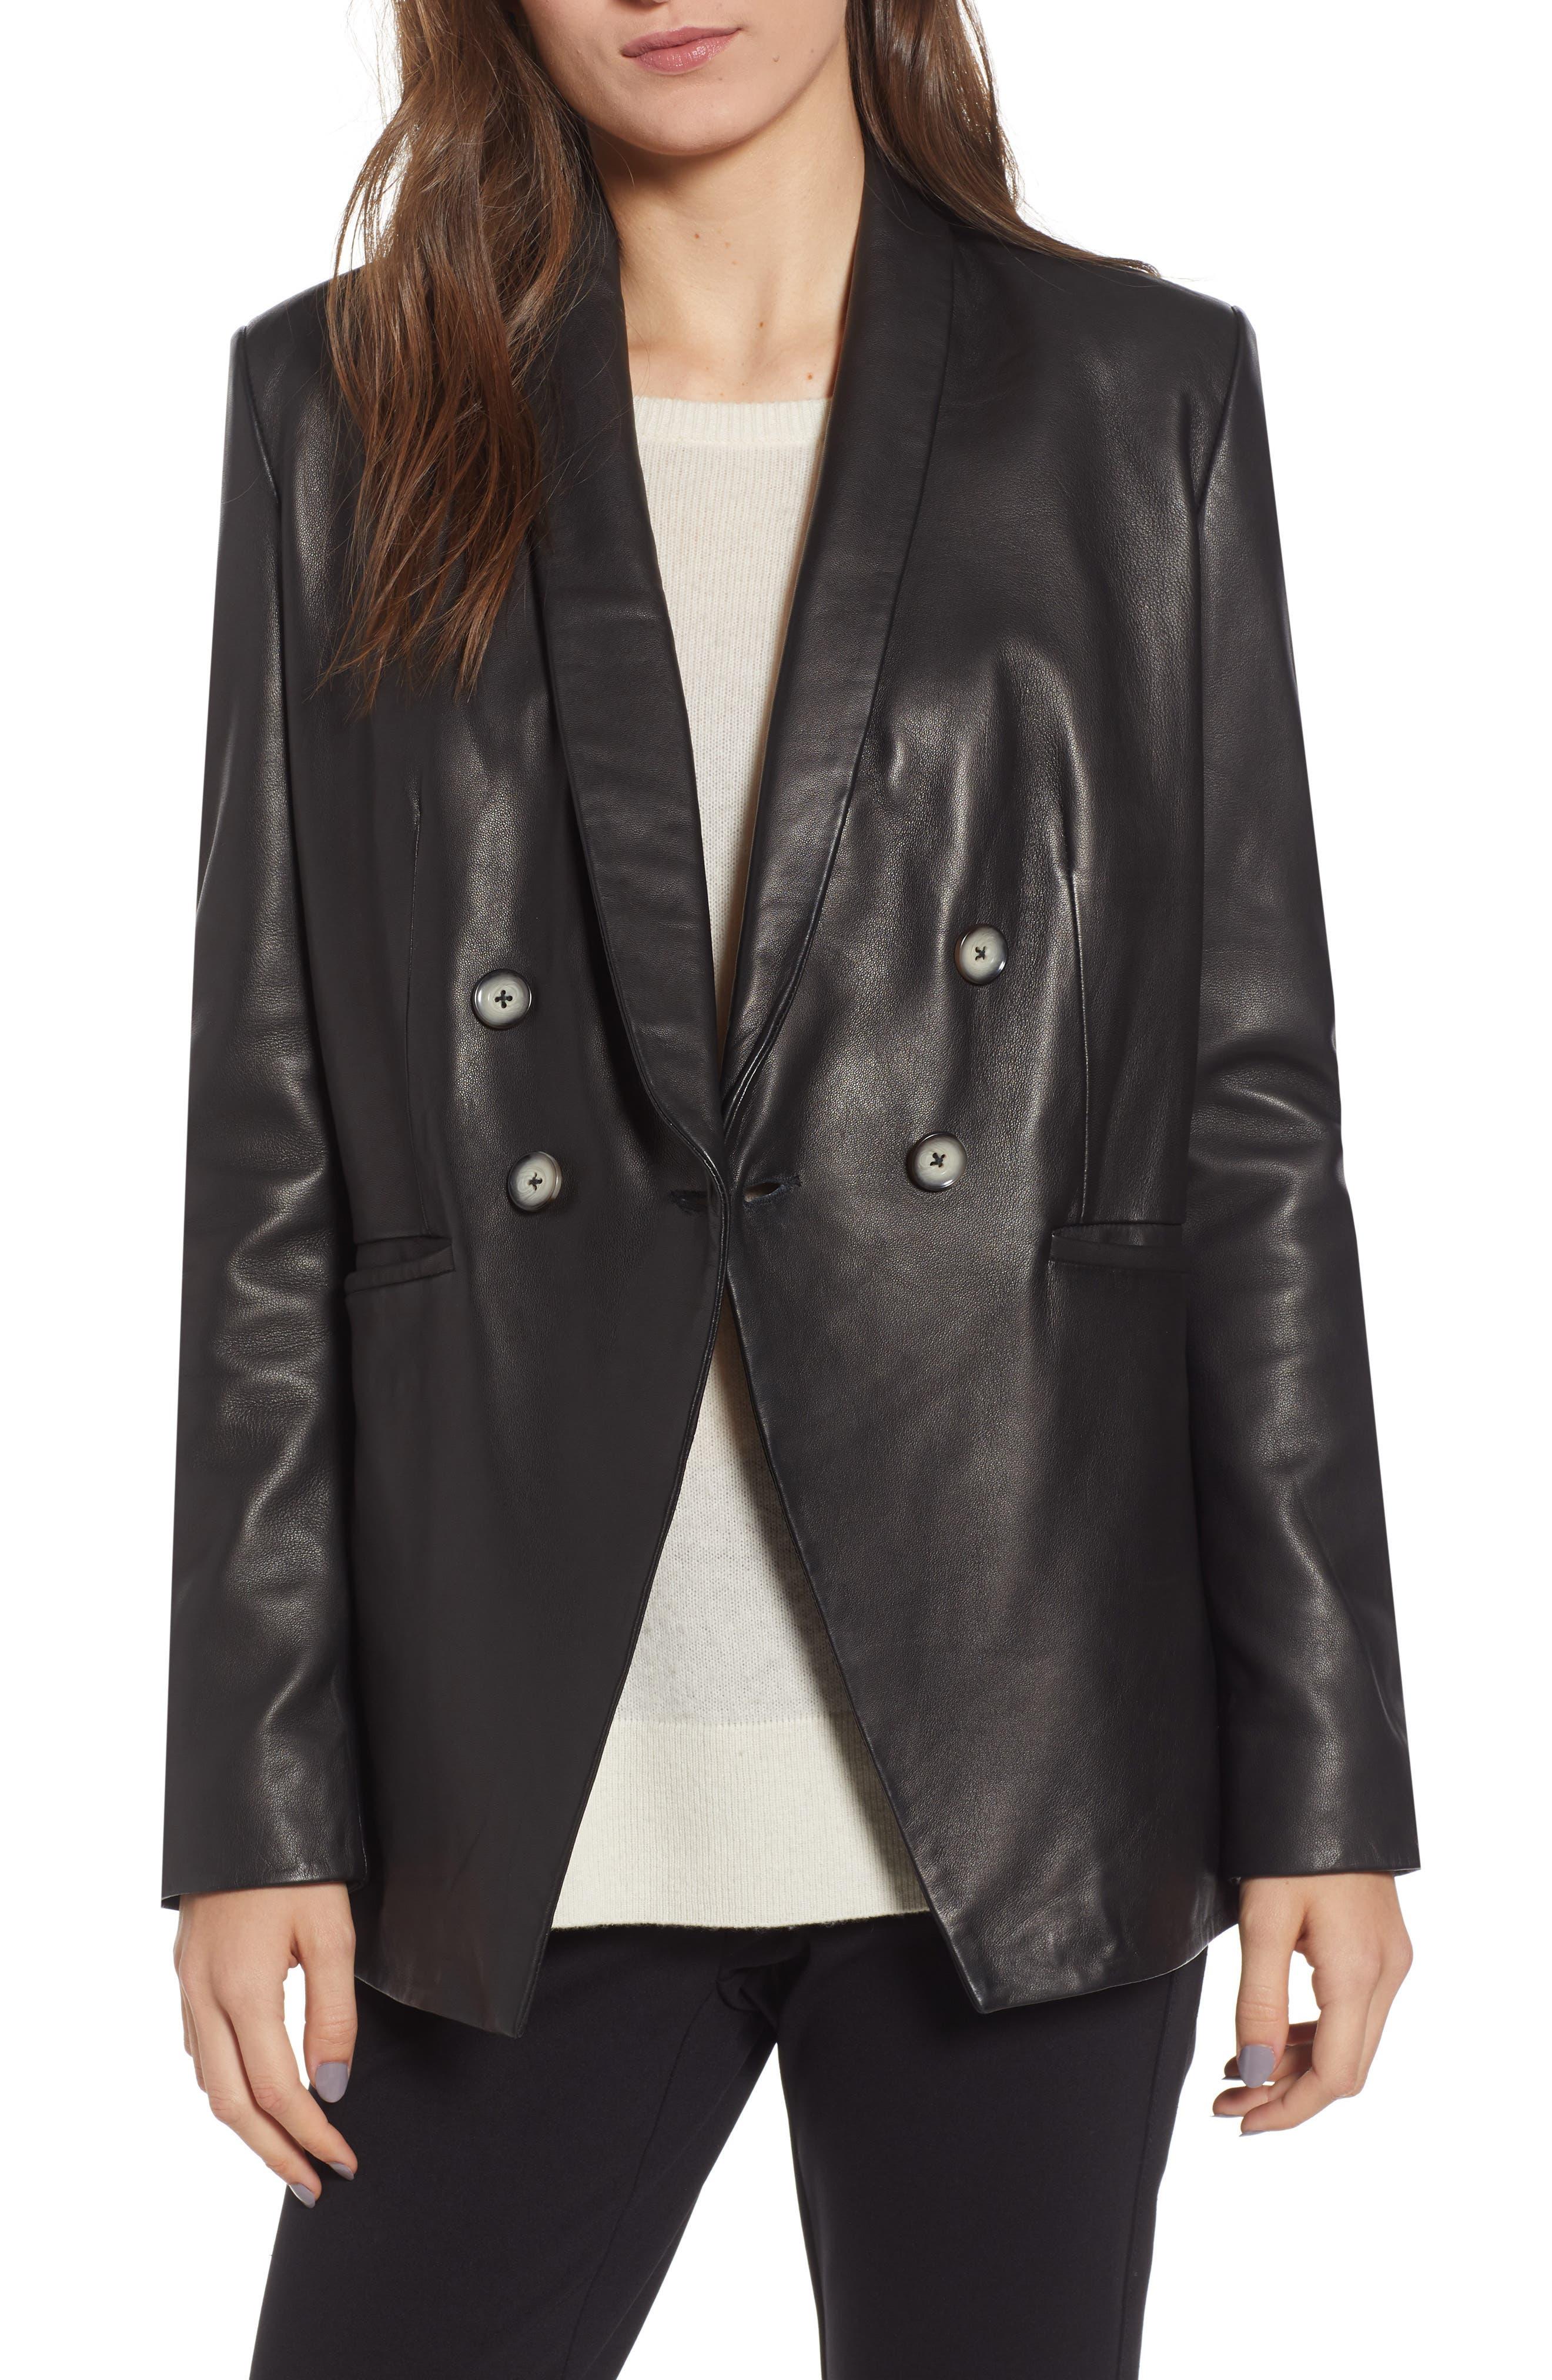 LAMARQUE Semi Fitted Leather Blazer in Black